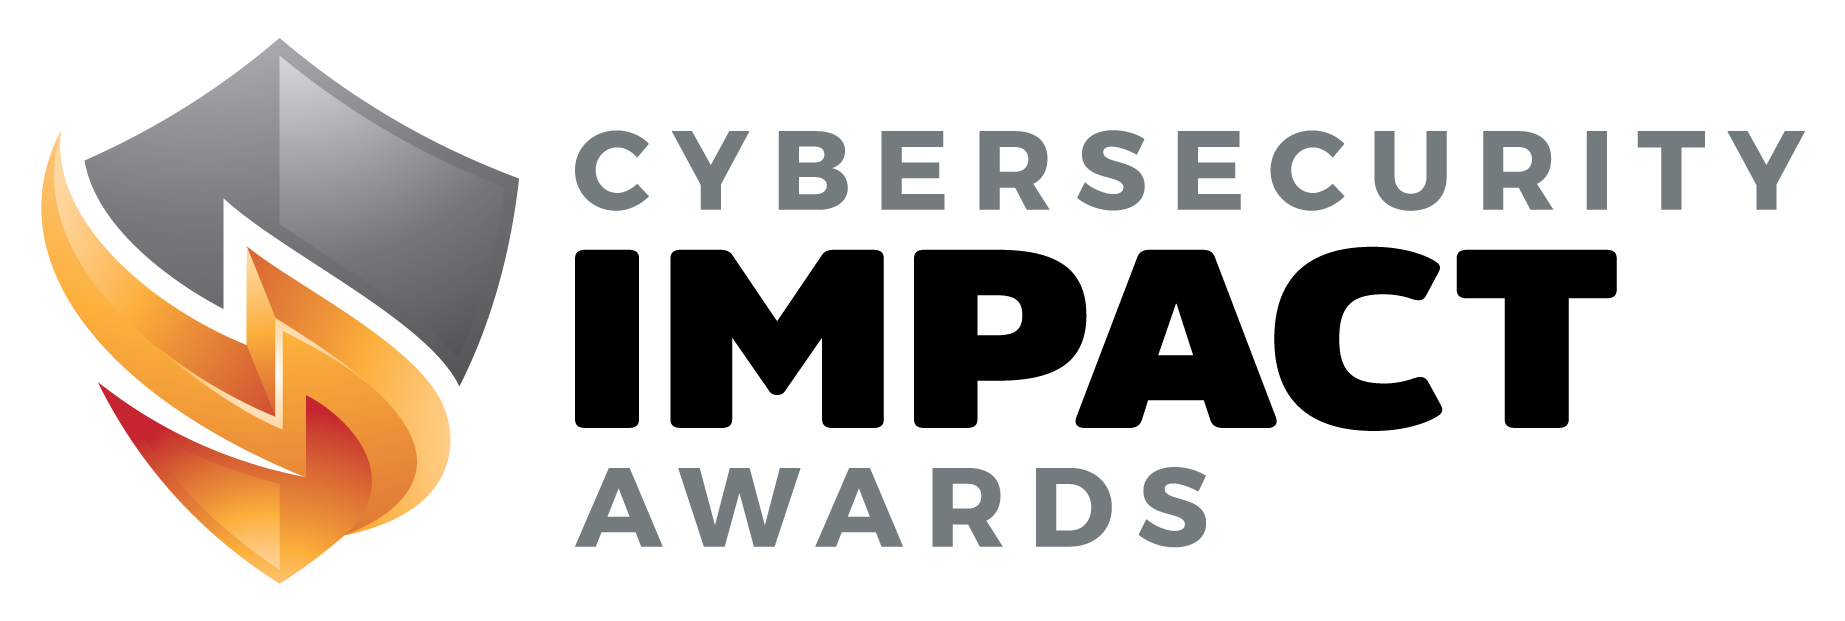 Cybersecurity Impact Awards logo